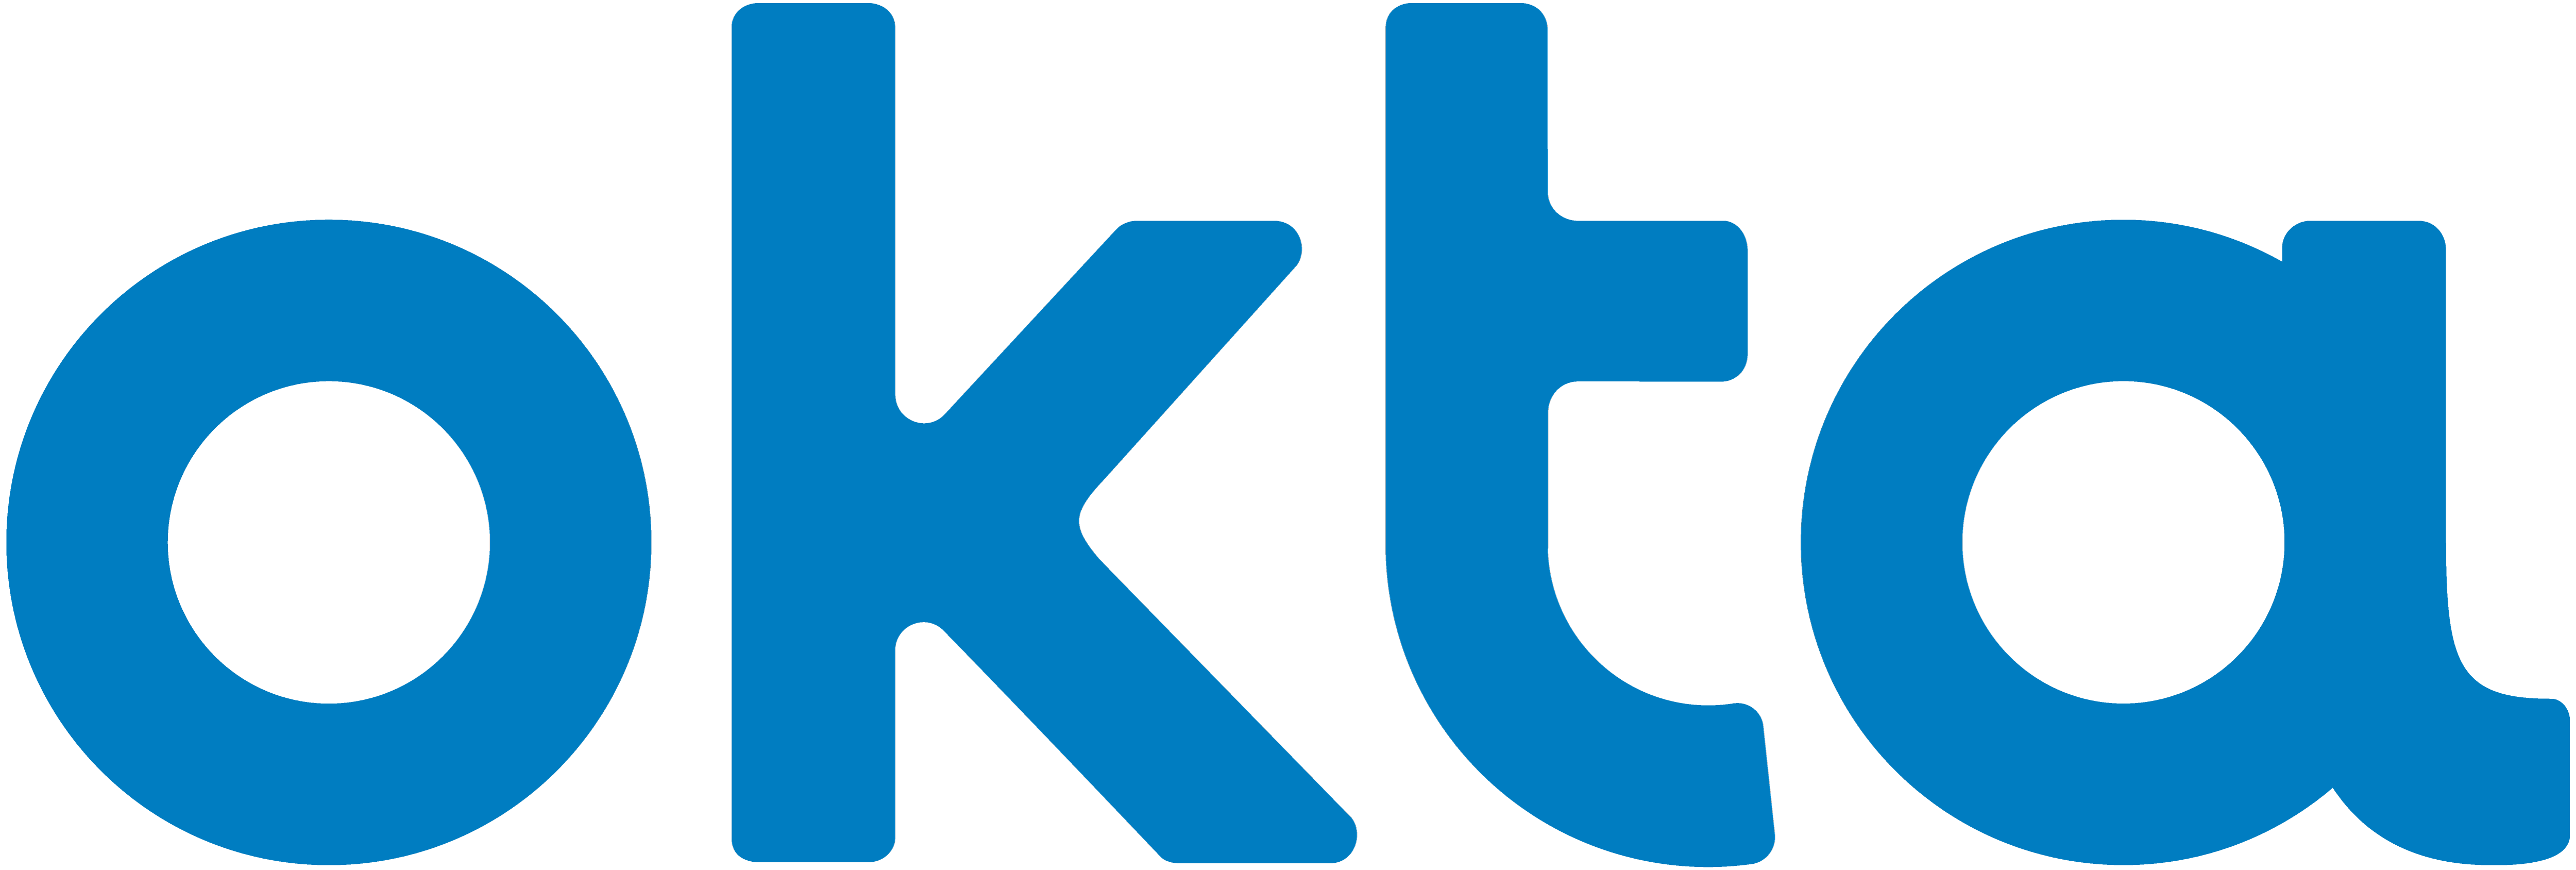 Okta Integration - Dropbox